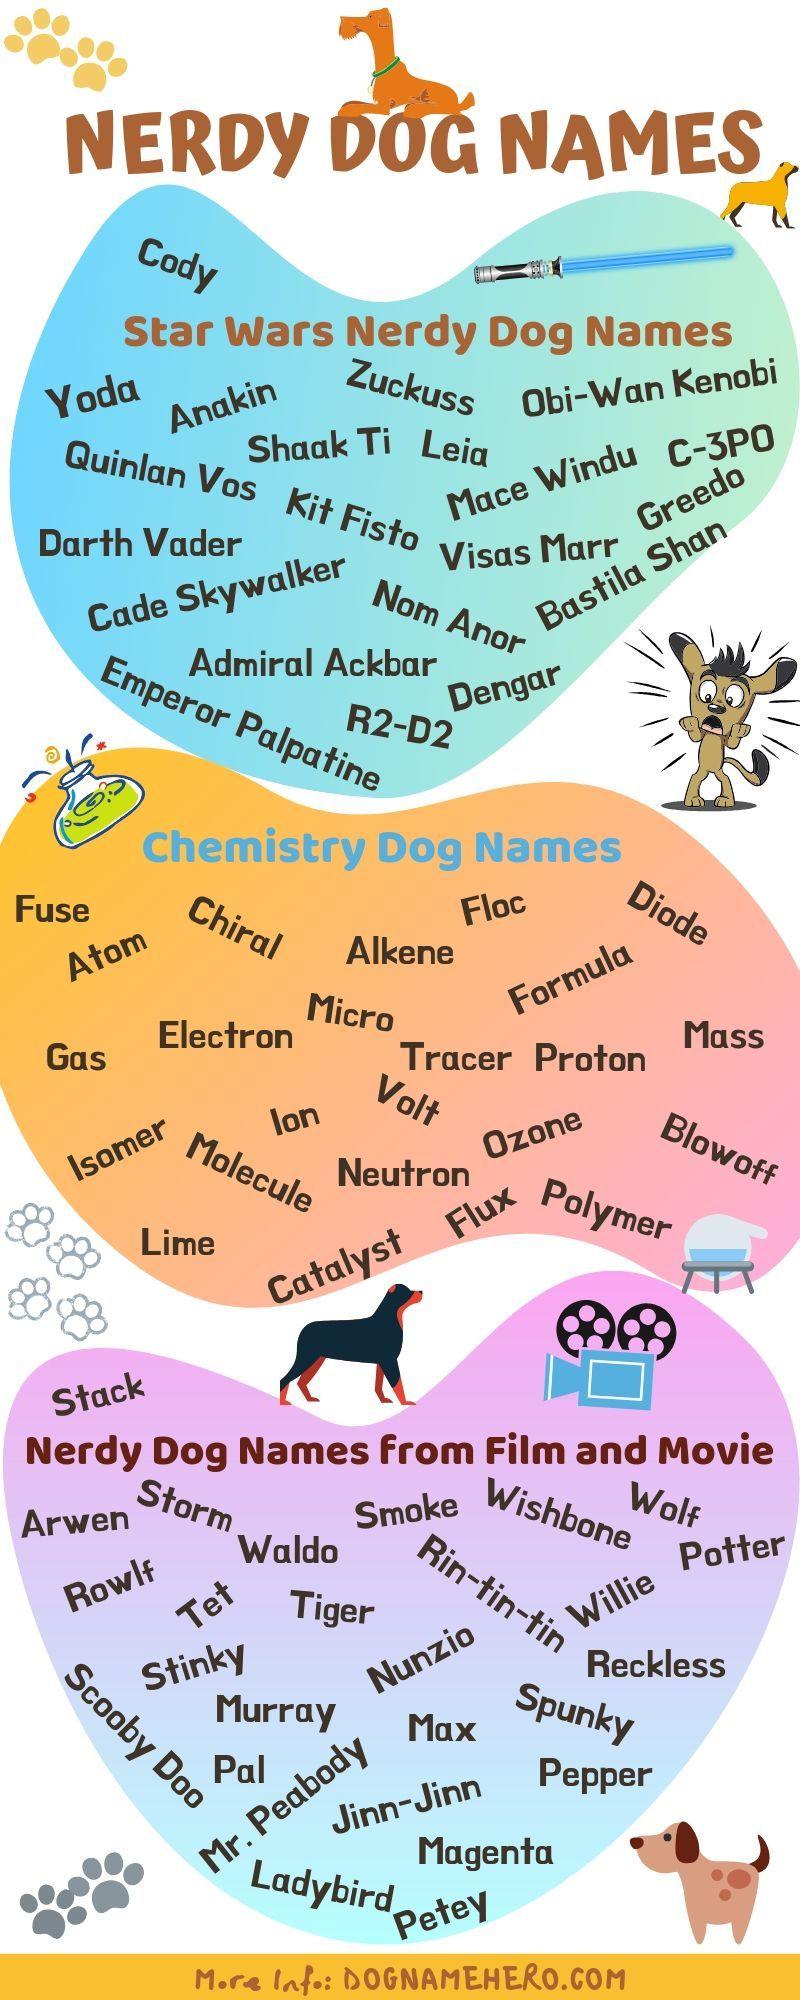 Nerdy Dog Names Best Geeky Dog Names Dog Name Hero Dog Names Nerdy Dogs